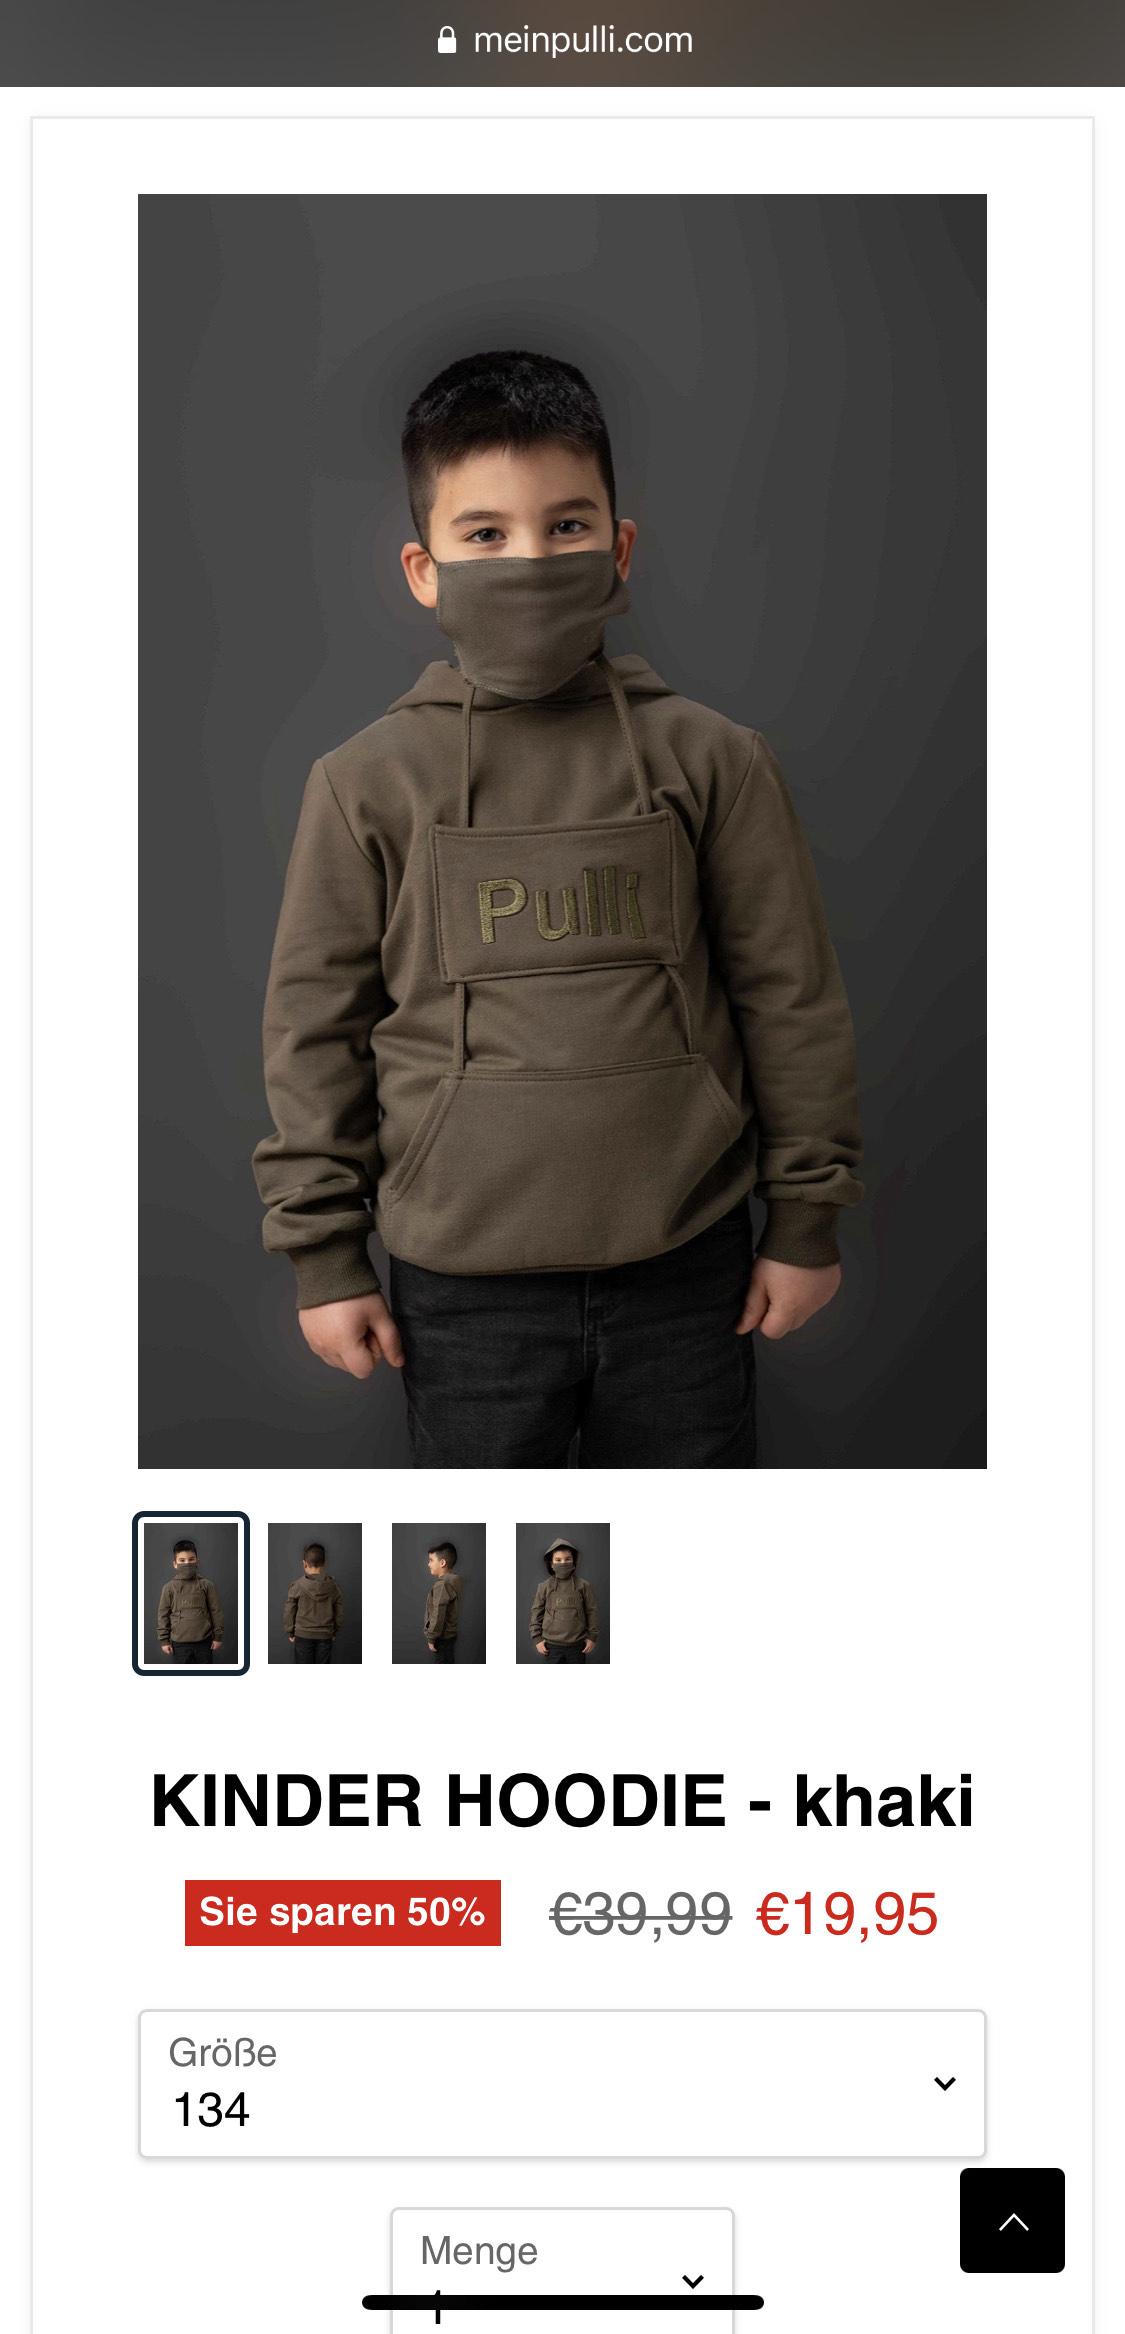 50% Sale auf meinpulli.com + 2 FFP2 Masken je Pulli